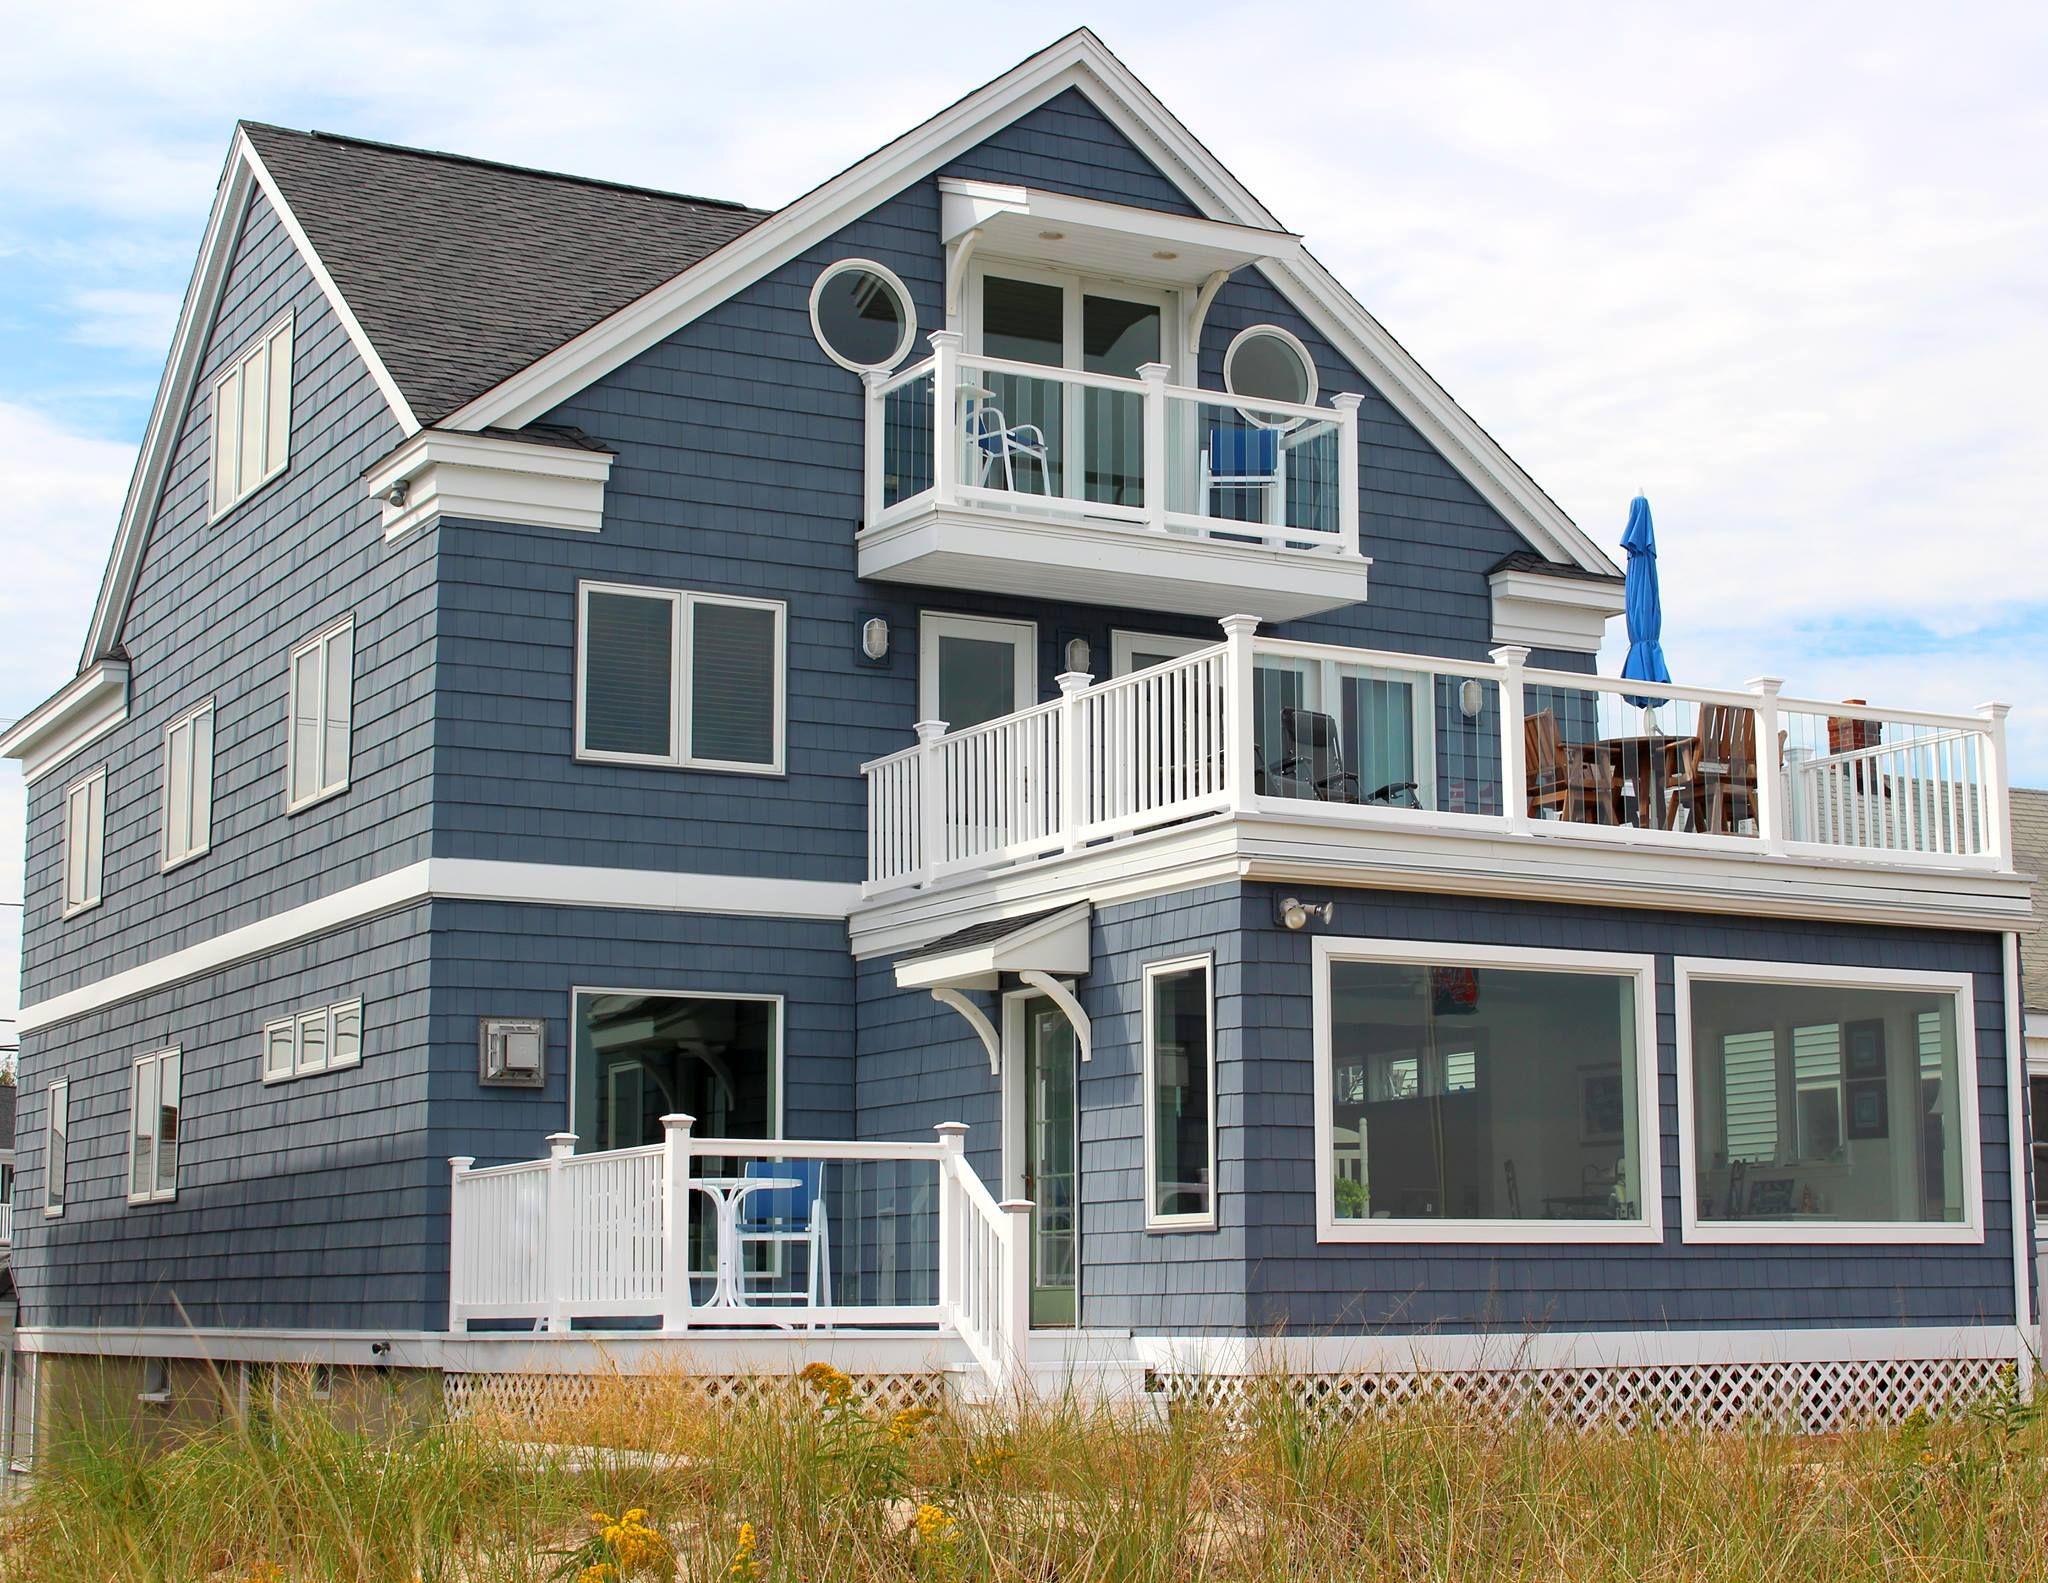 desktopretina deals hotel hotels cottages c top cheap guide travel hampton beach